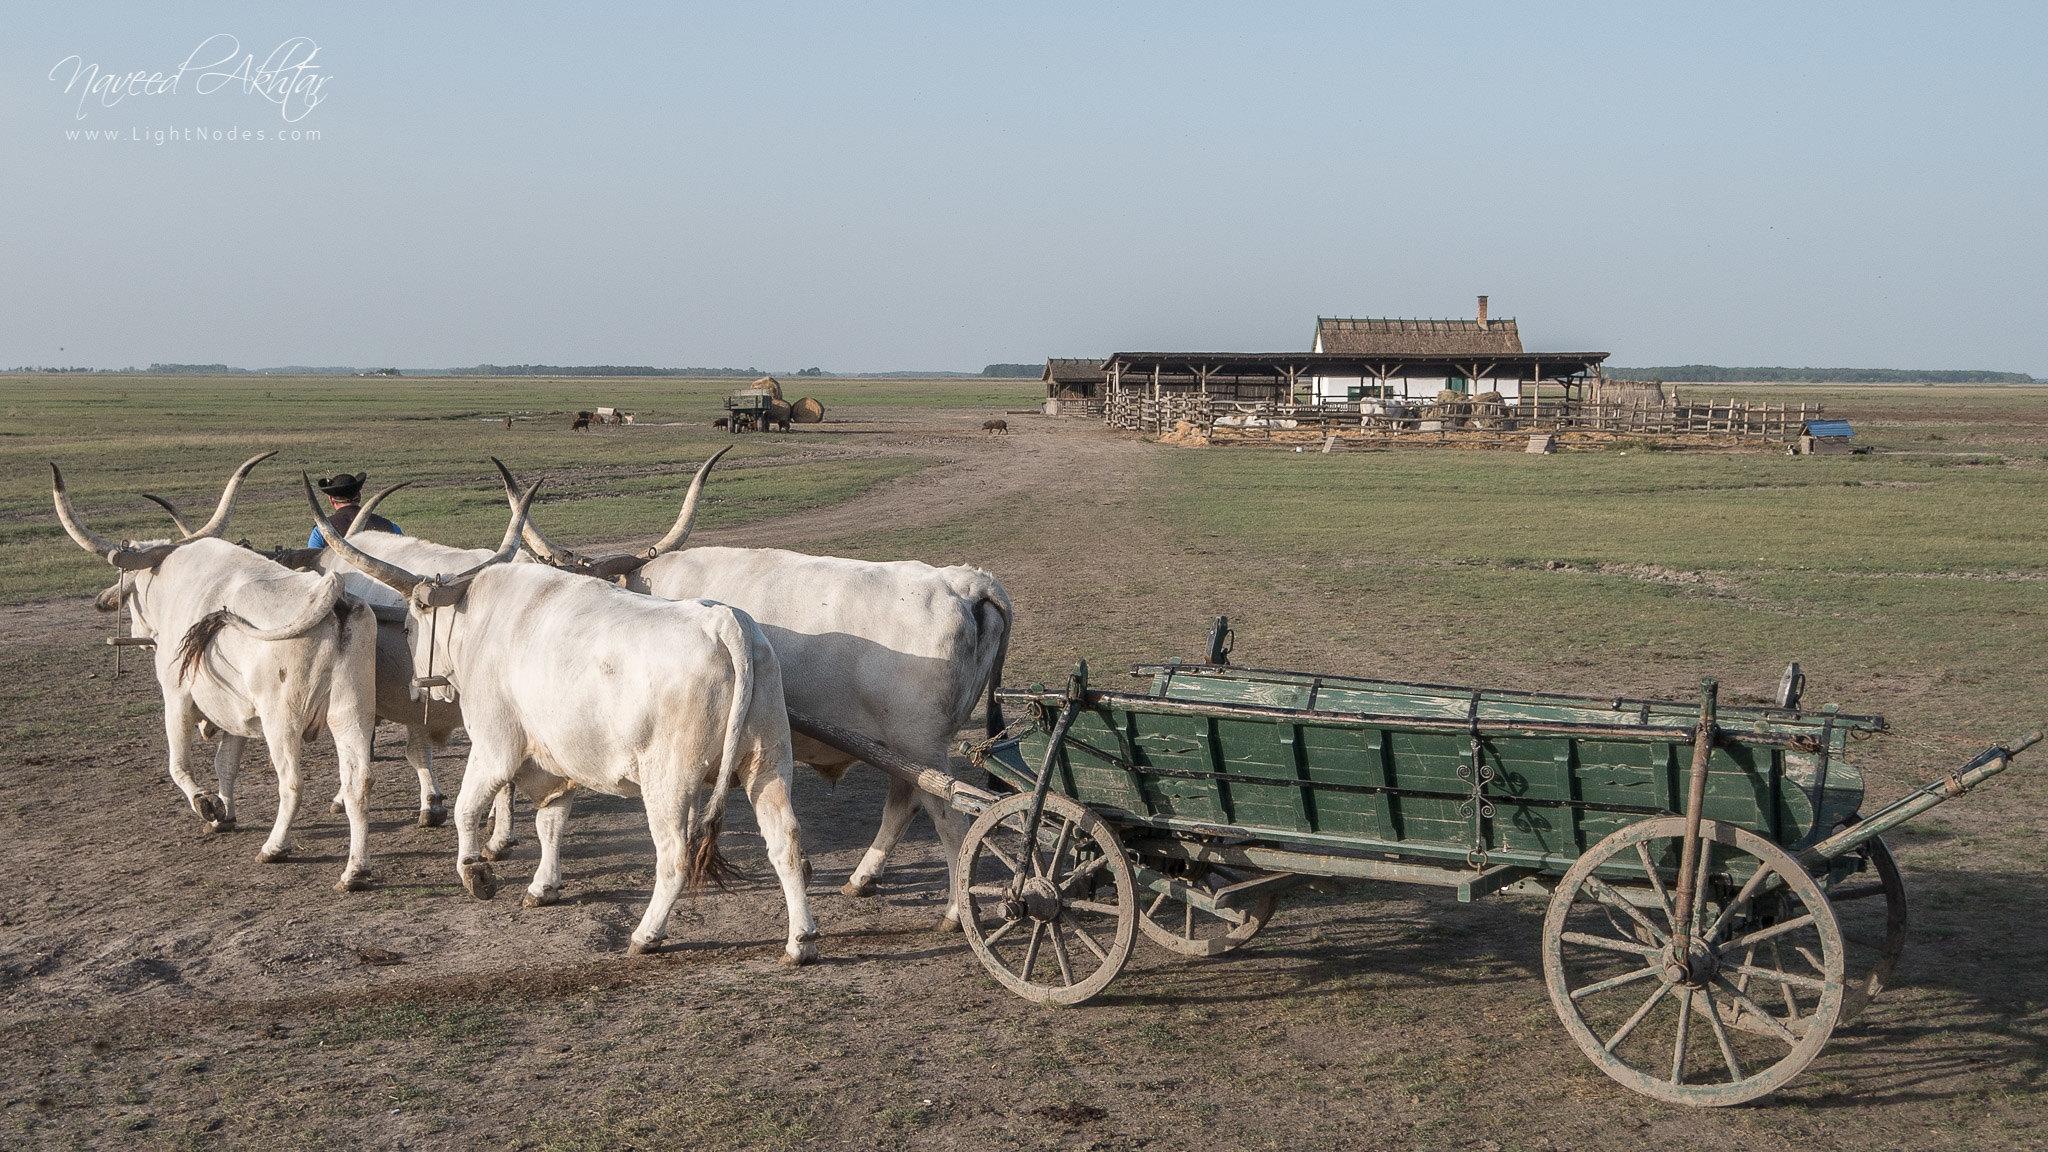 Going back to home. Hungarian countryside near Hortobagy in Hortobágy, Hajdú-Bihar, Hungary with Panasonic DMC-GX7